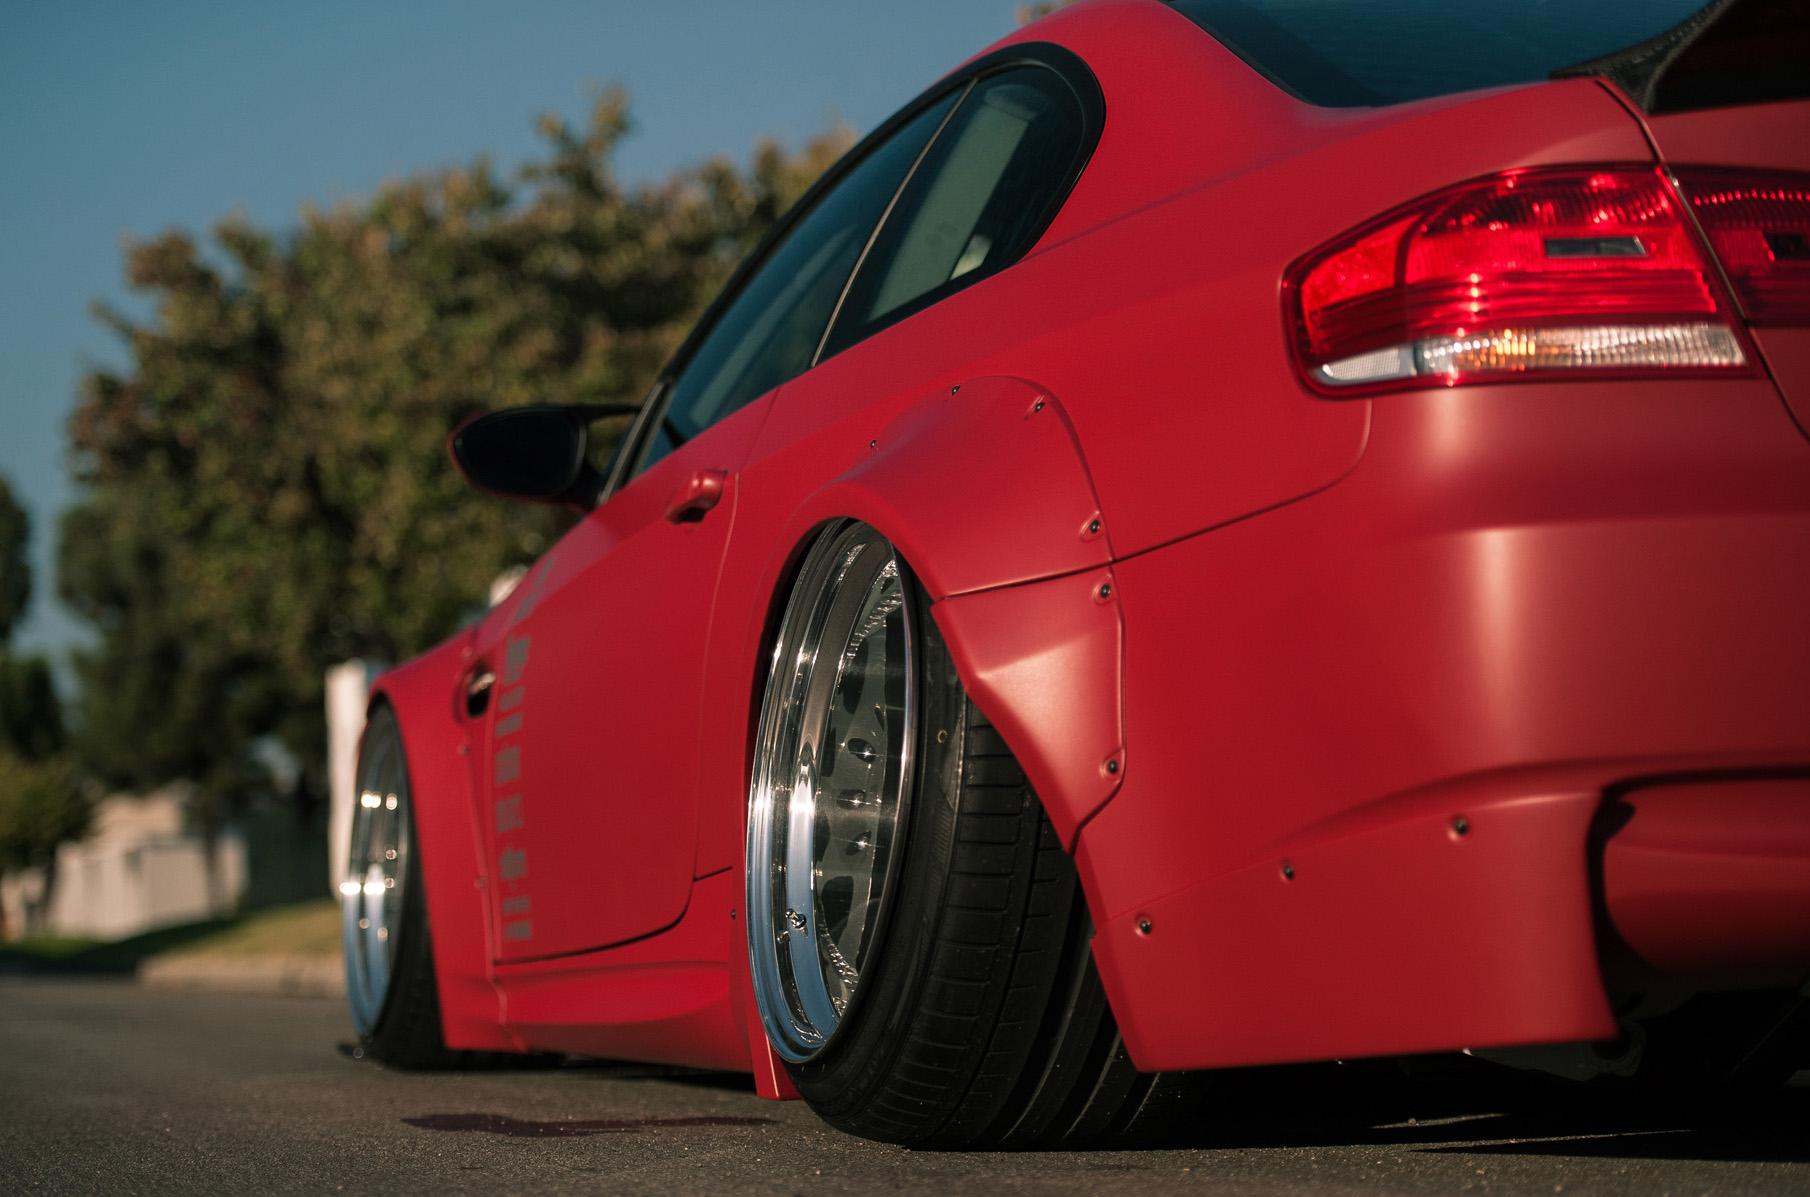 2009_Bagriders_BMW_E92_335ix_tuning_lowrider_wheel______g_1920x1278.jpg